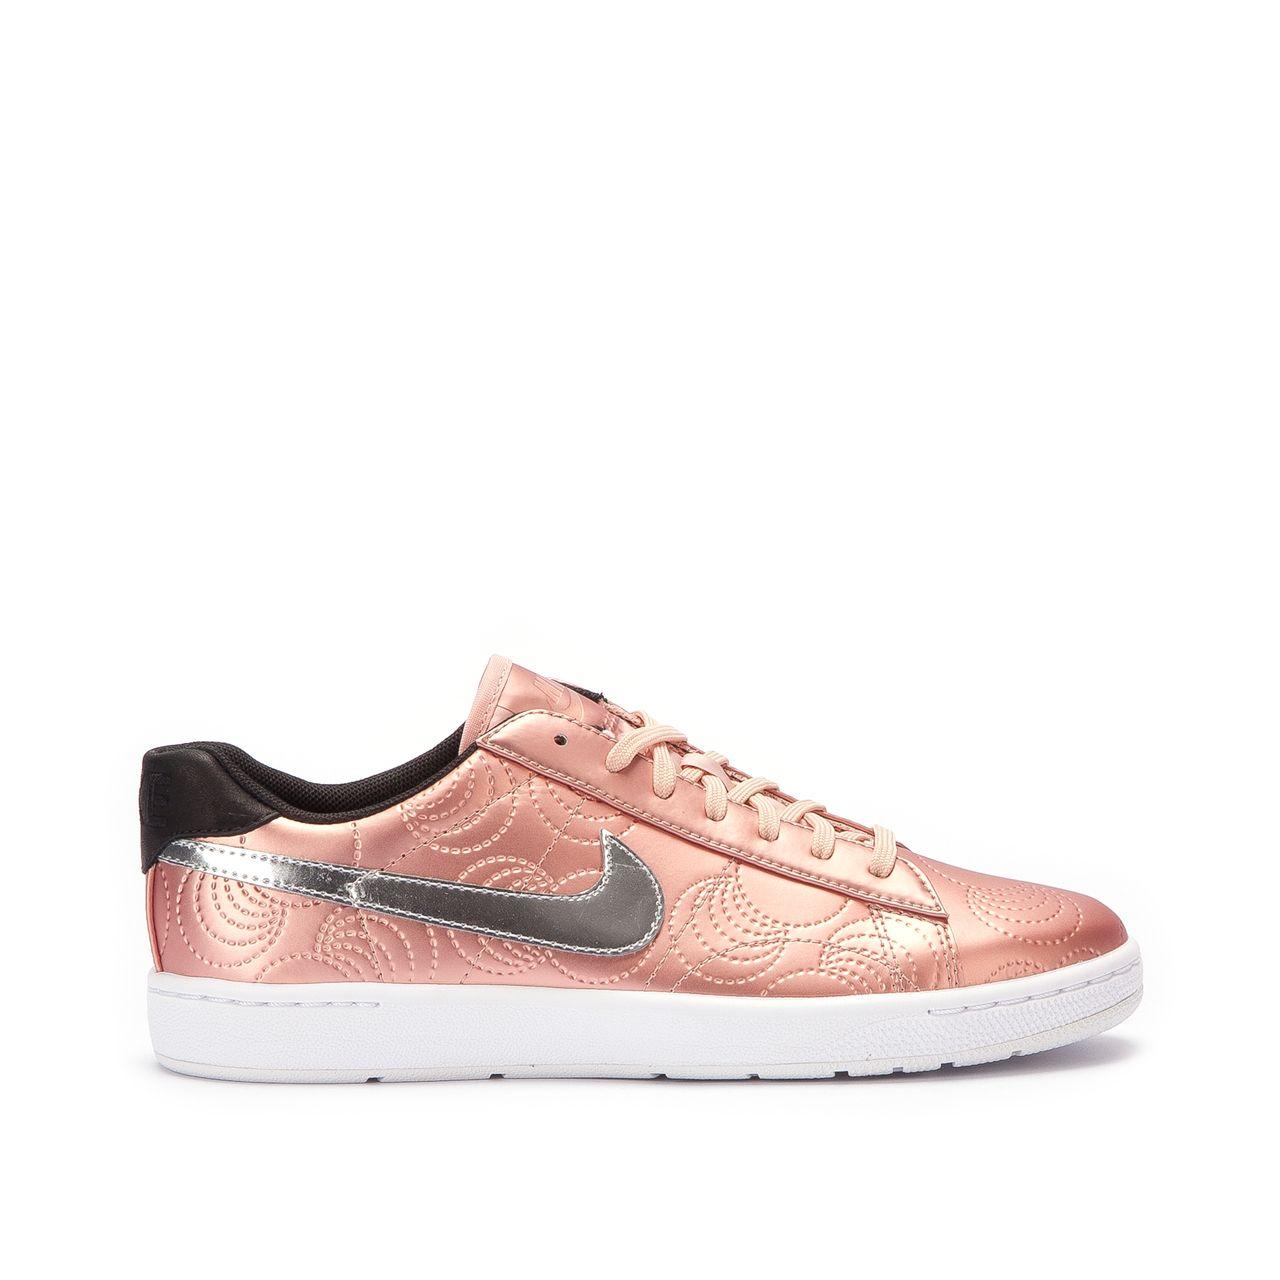 77c38fe9001 Nike WMNS Tennis Classic Ultra LOTC QS (Rose Gold)  sneakers  sneakerhead